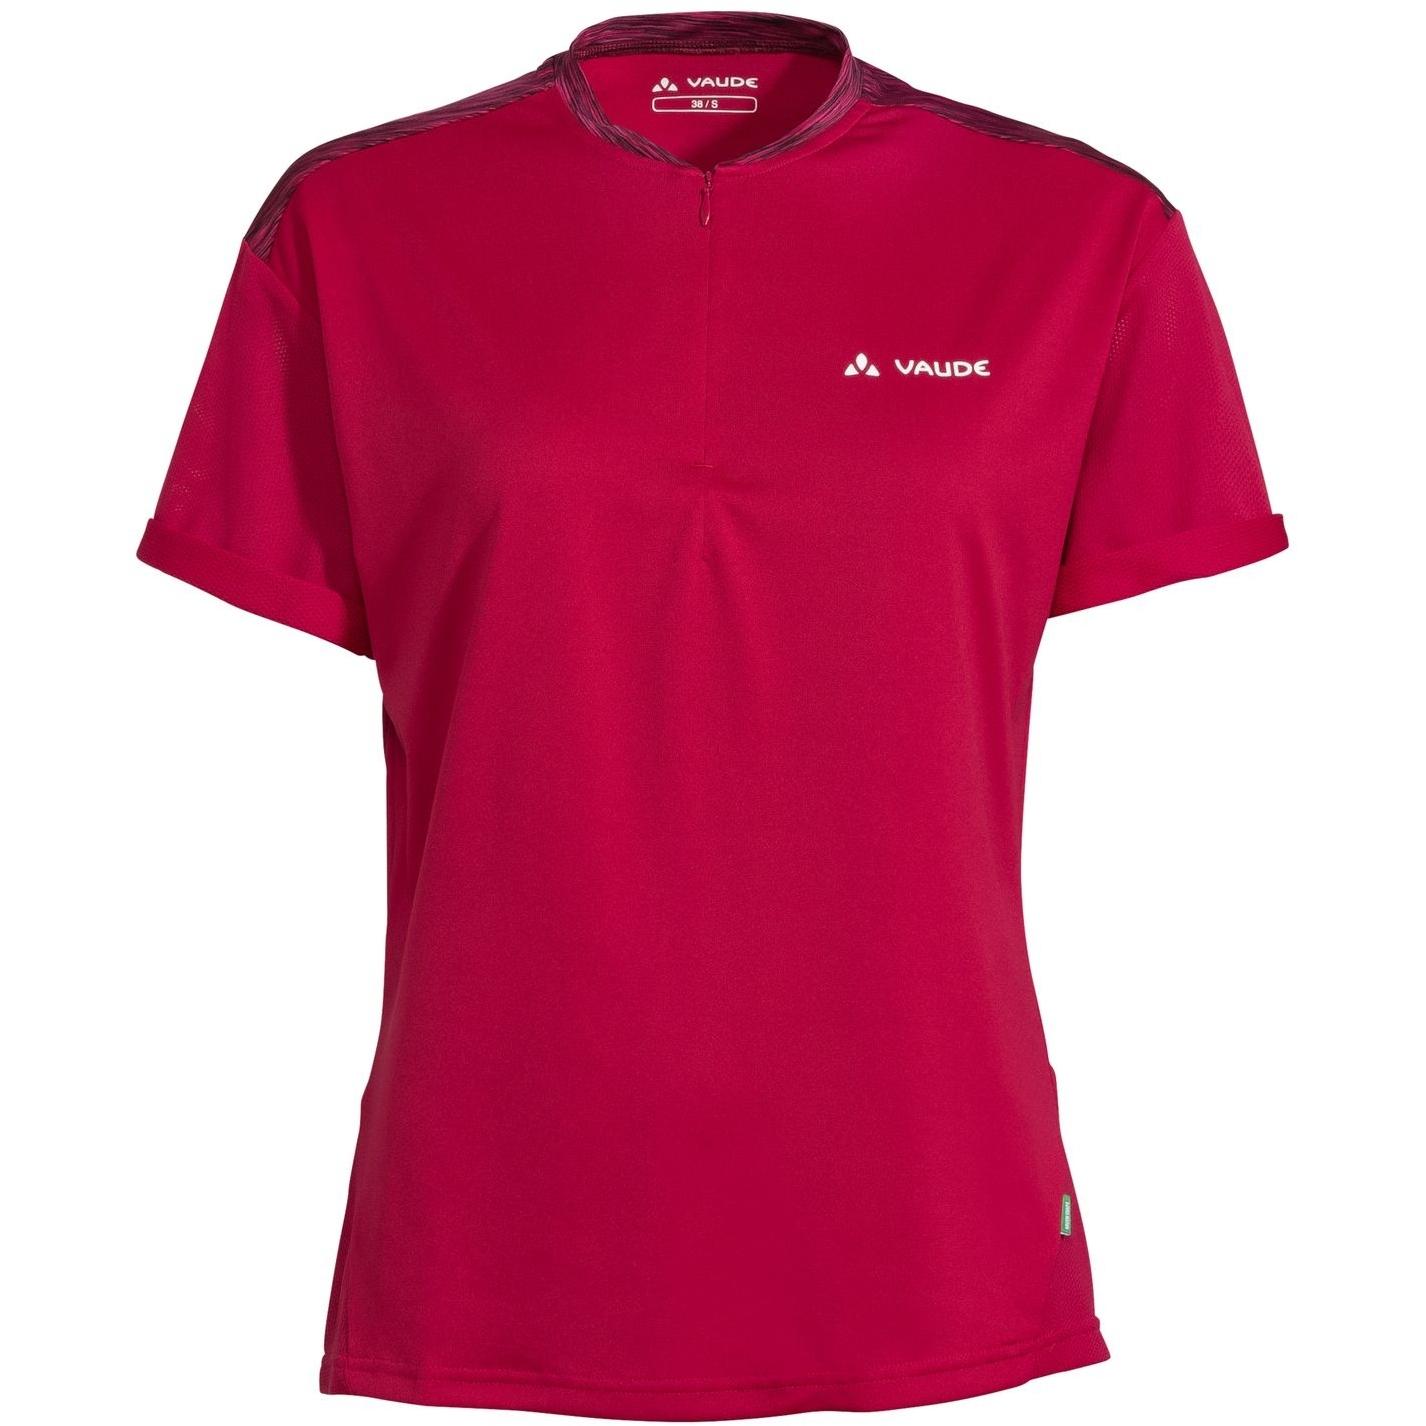 Vaude Qimsa Damen T-Shirt - crimson red